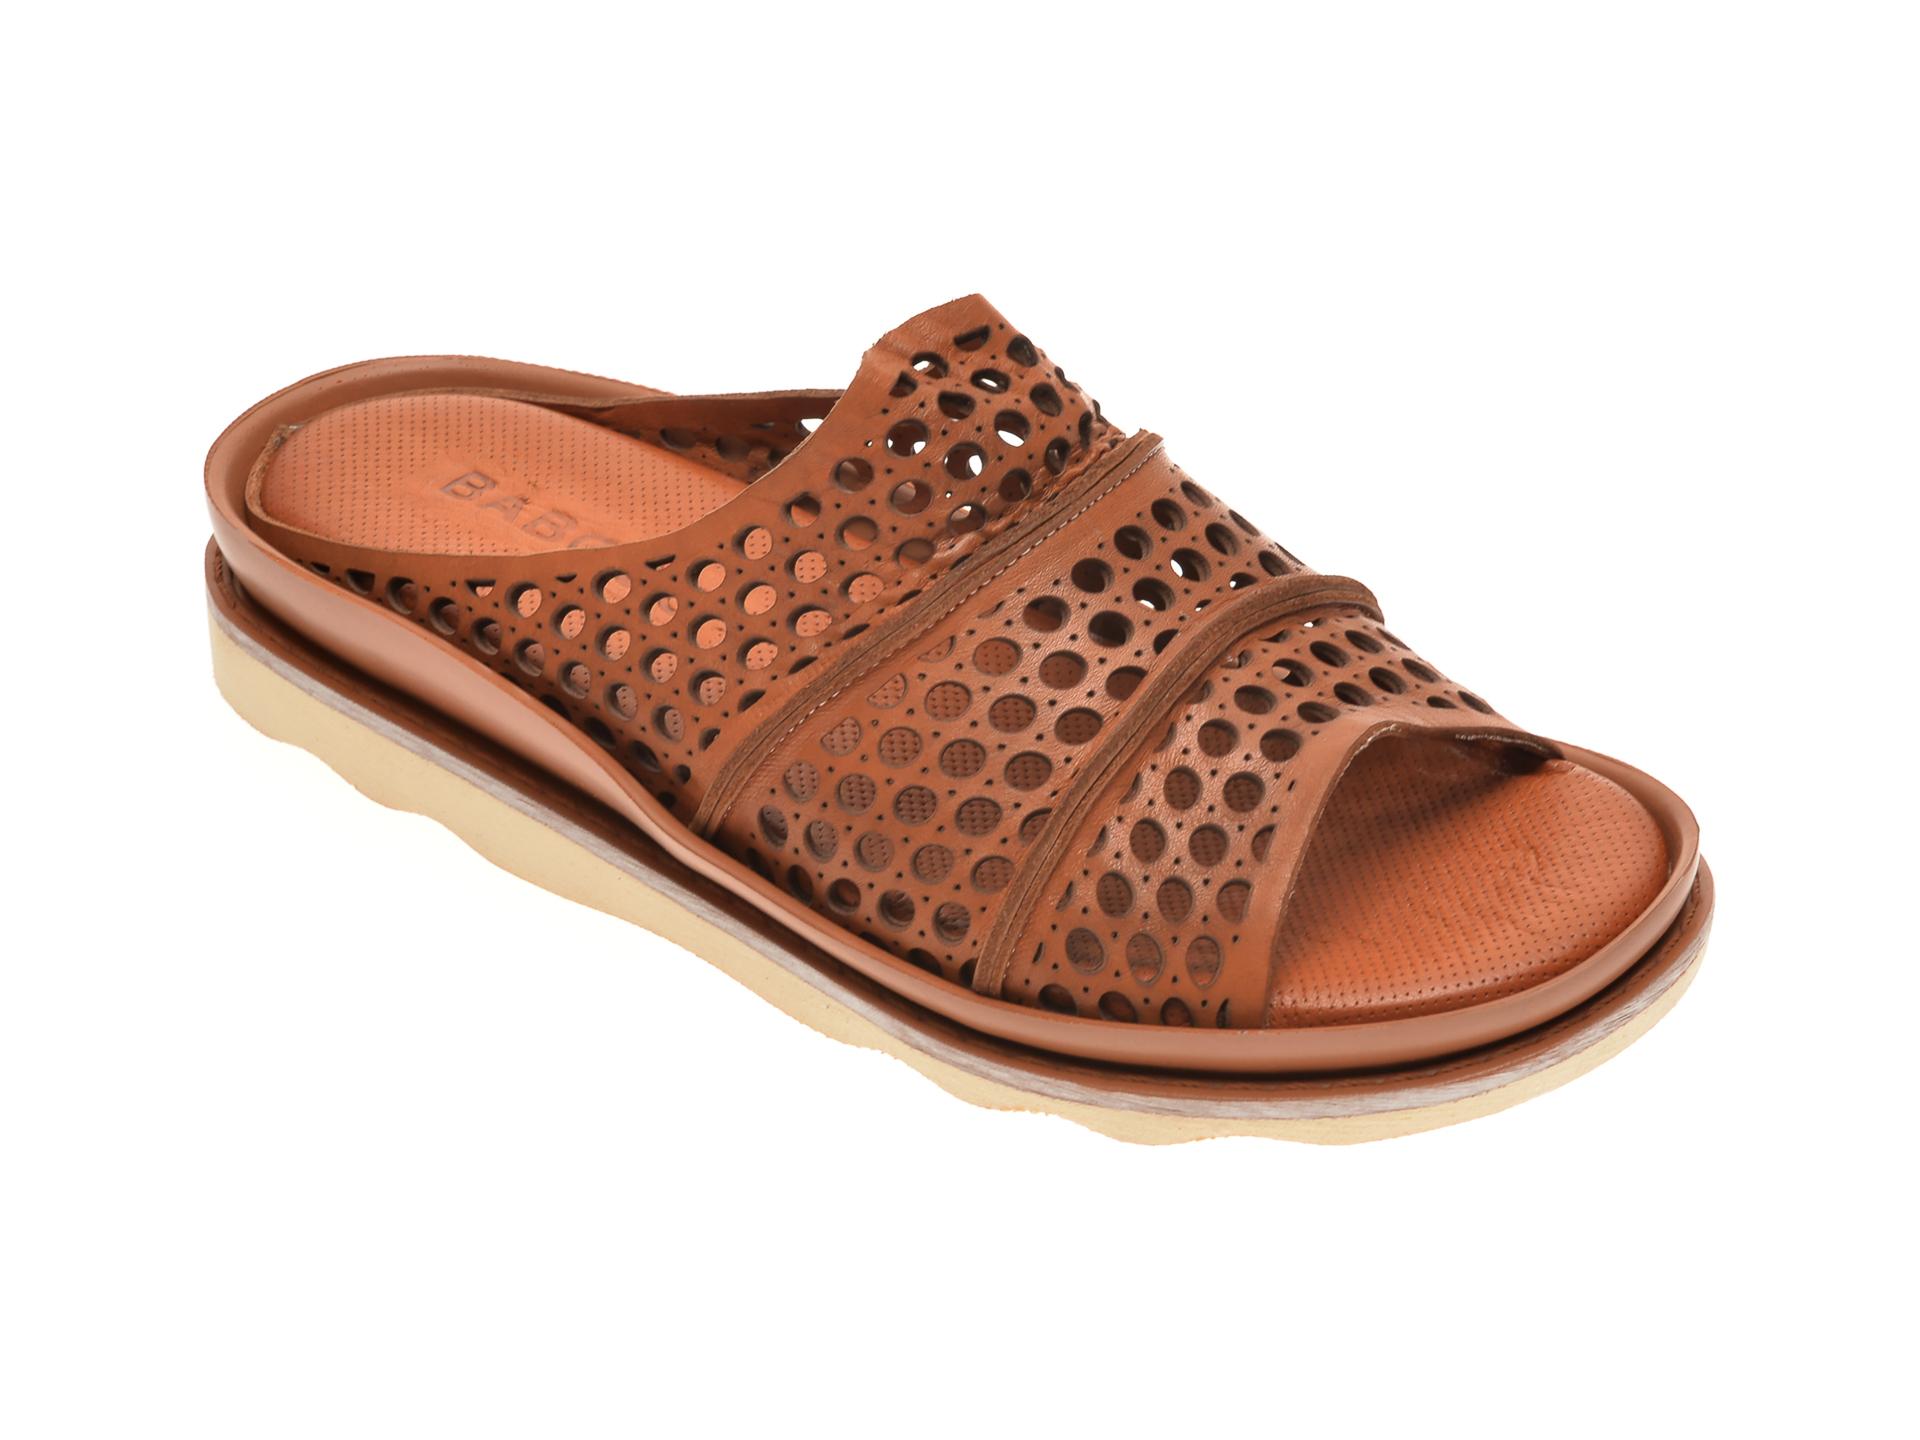 Papuci BABOOS maro, 0405, din piele naturala imagine